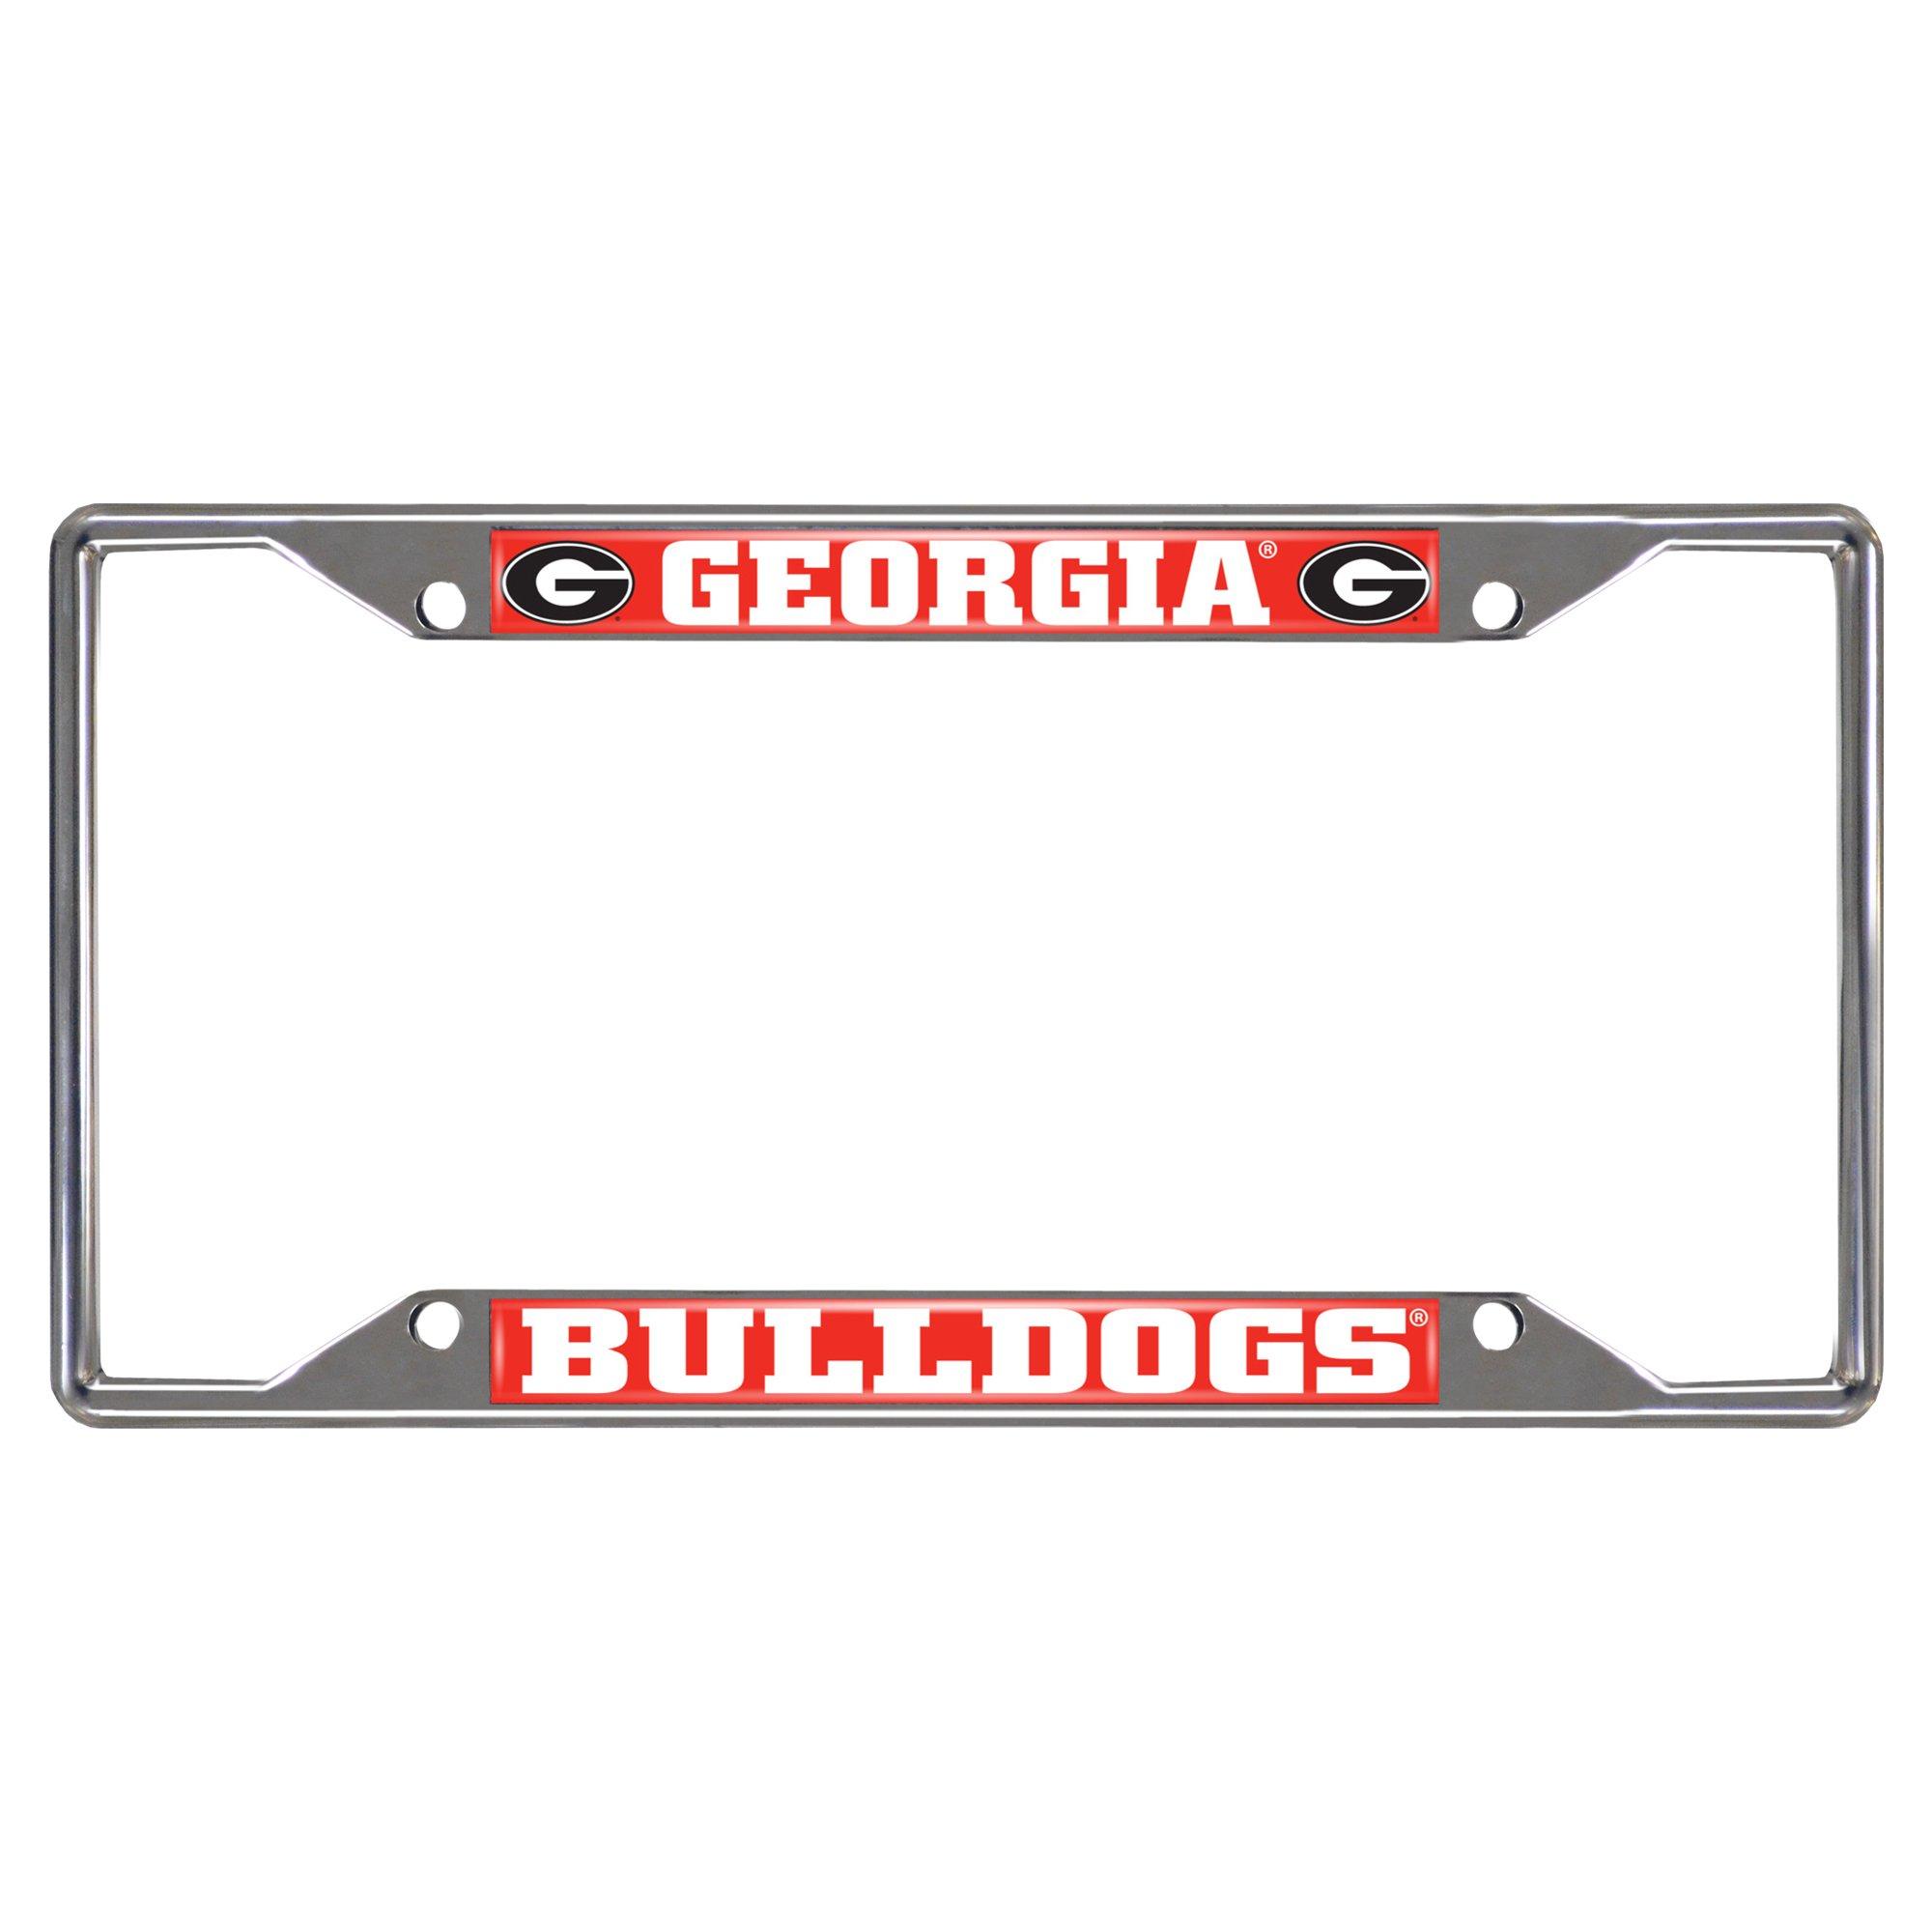 Fanmats NCAA University of Georgia Bulldogs Chrome License Plate Frame by Fanmats